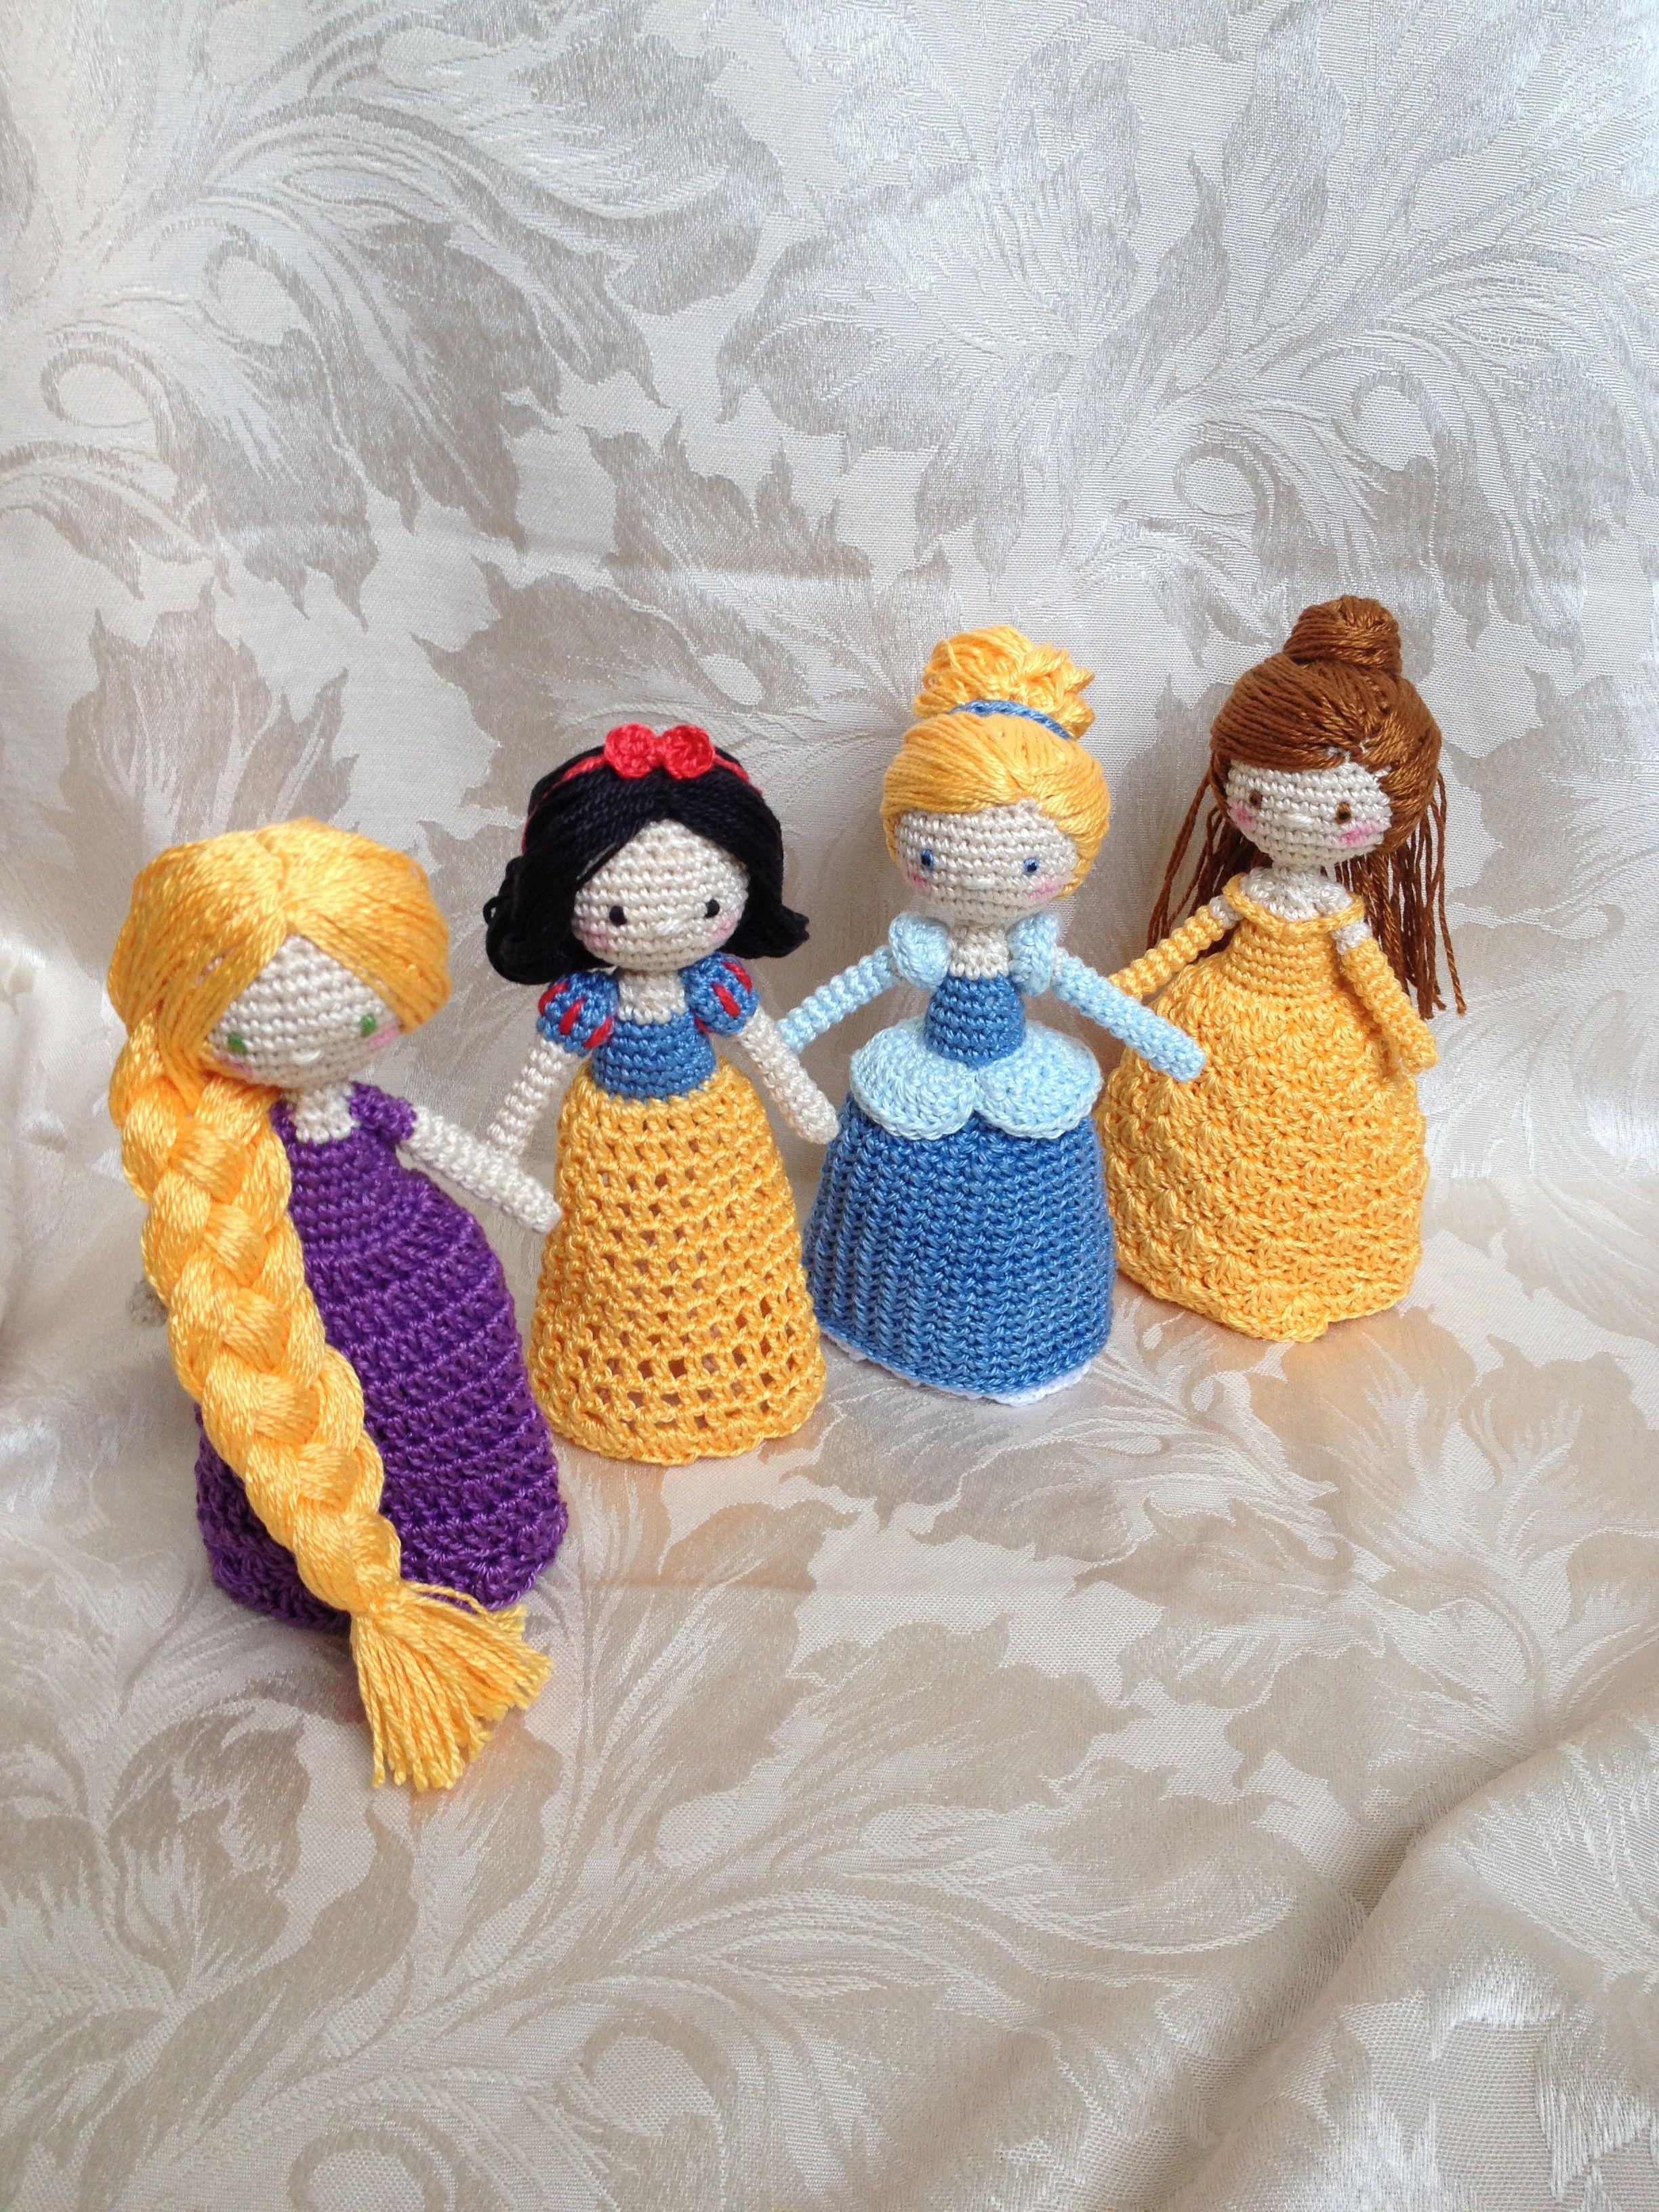 Crocheted princess dolls   Amigurumi   Pinterest   Princesas ...